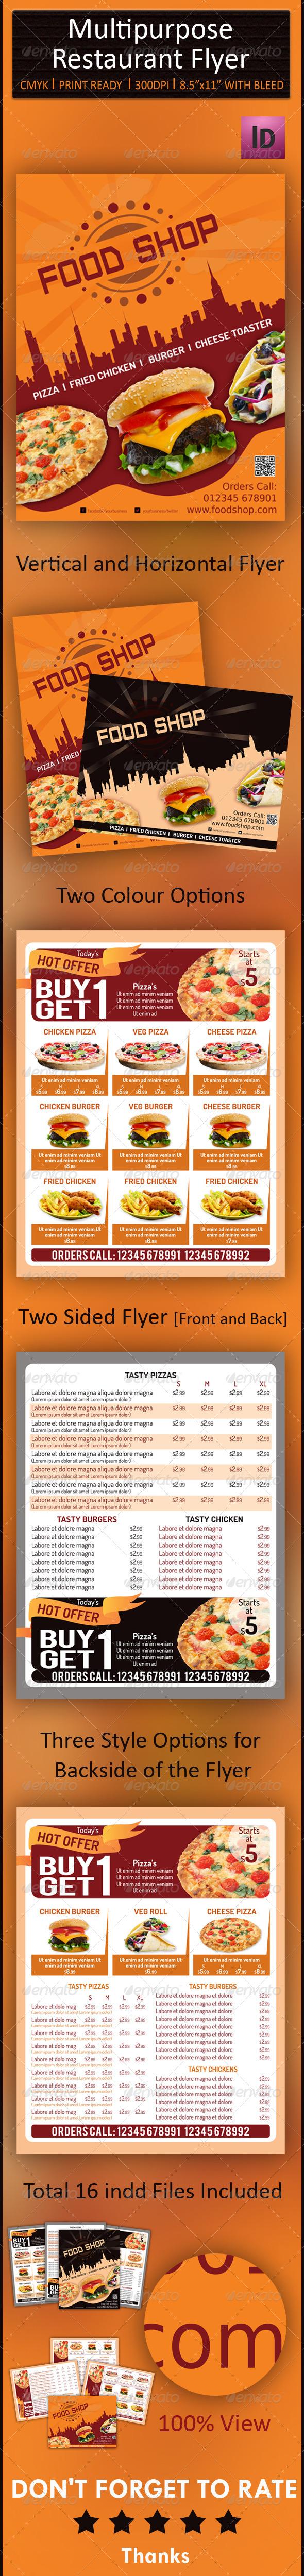 GraphicRiver Multipurpose Restaurant Flyer 6805291